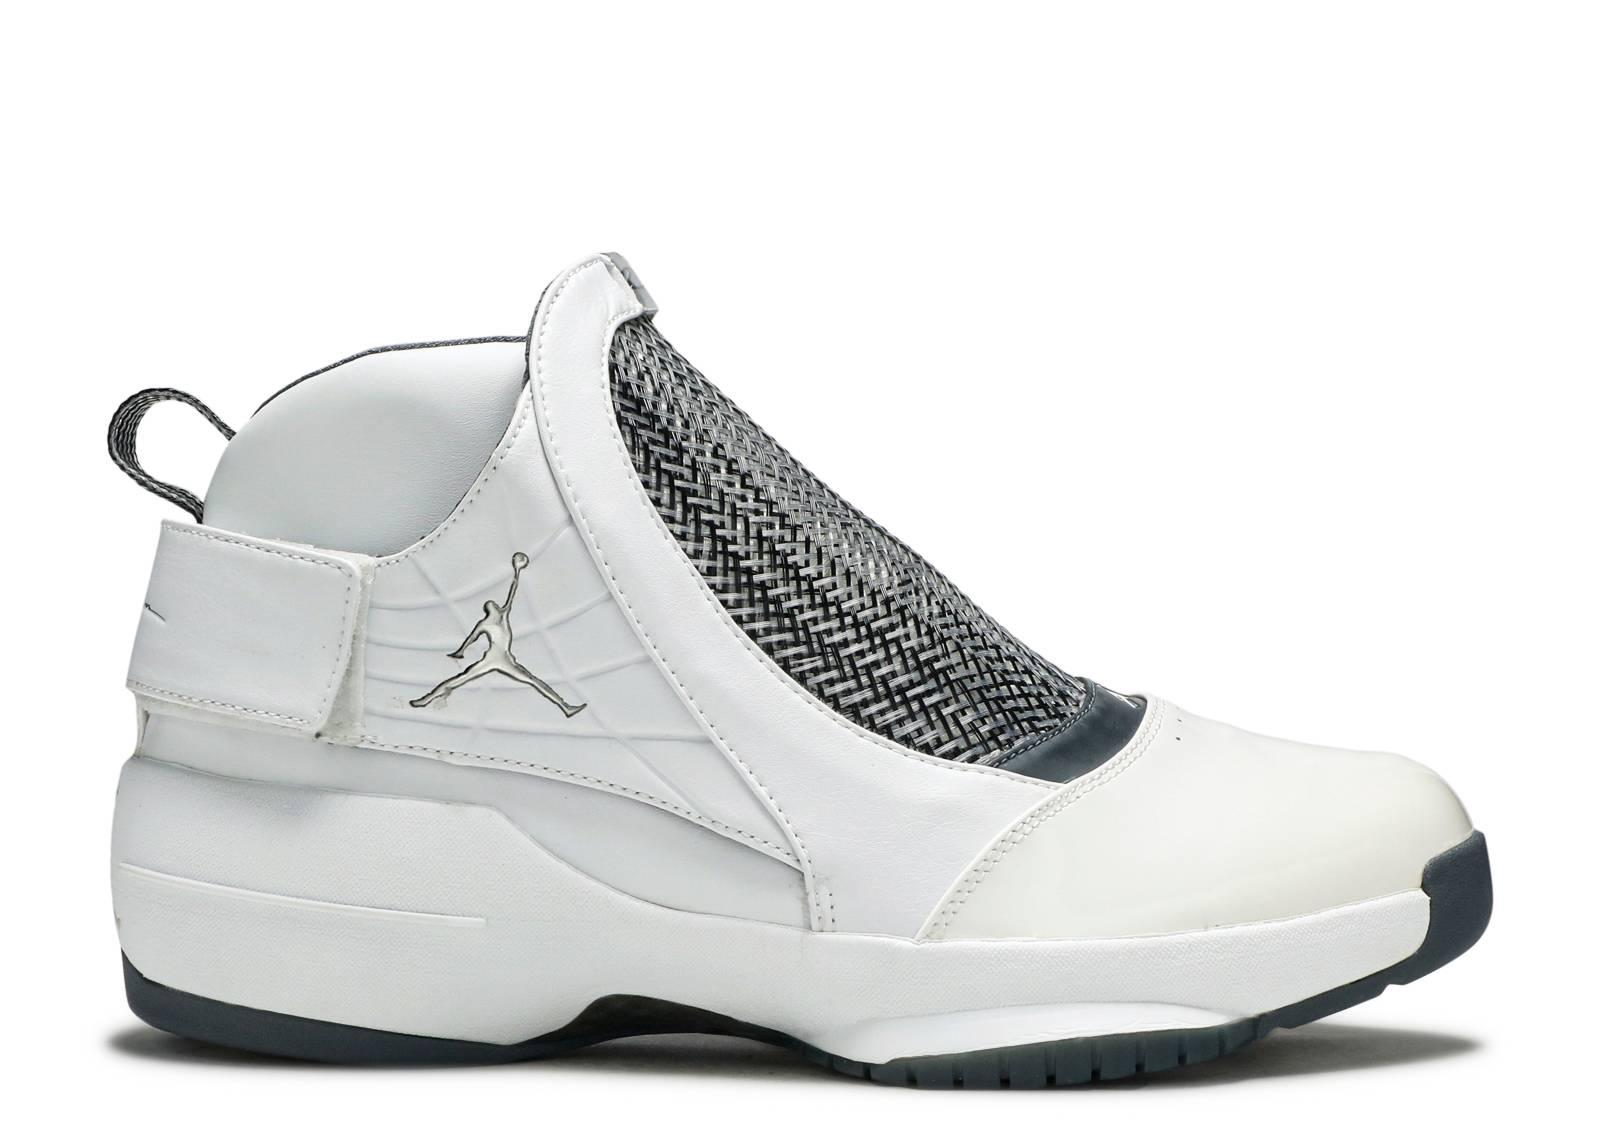 0539de0f1994e3 Air Jordan 19 - Air Jordan - 307546 102 - white chrome-flint grey-black